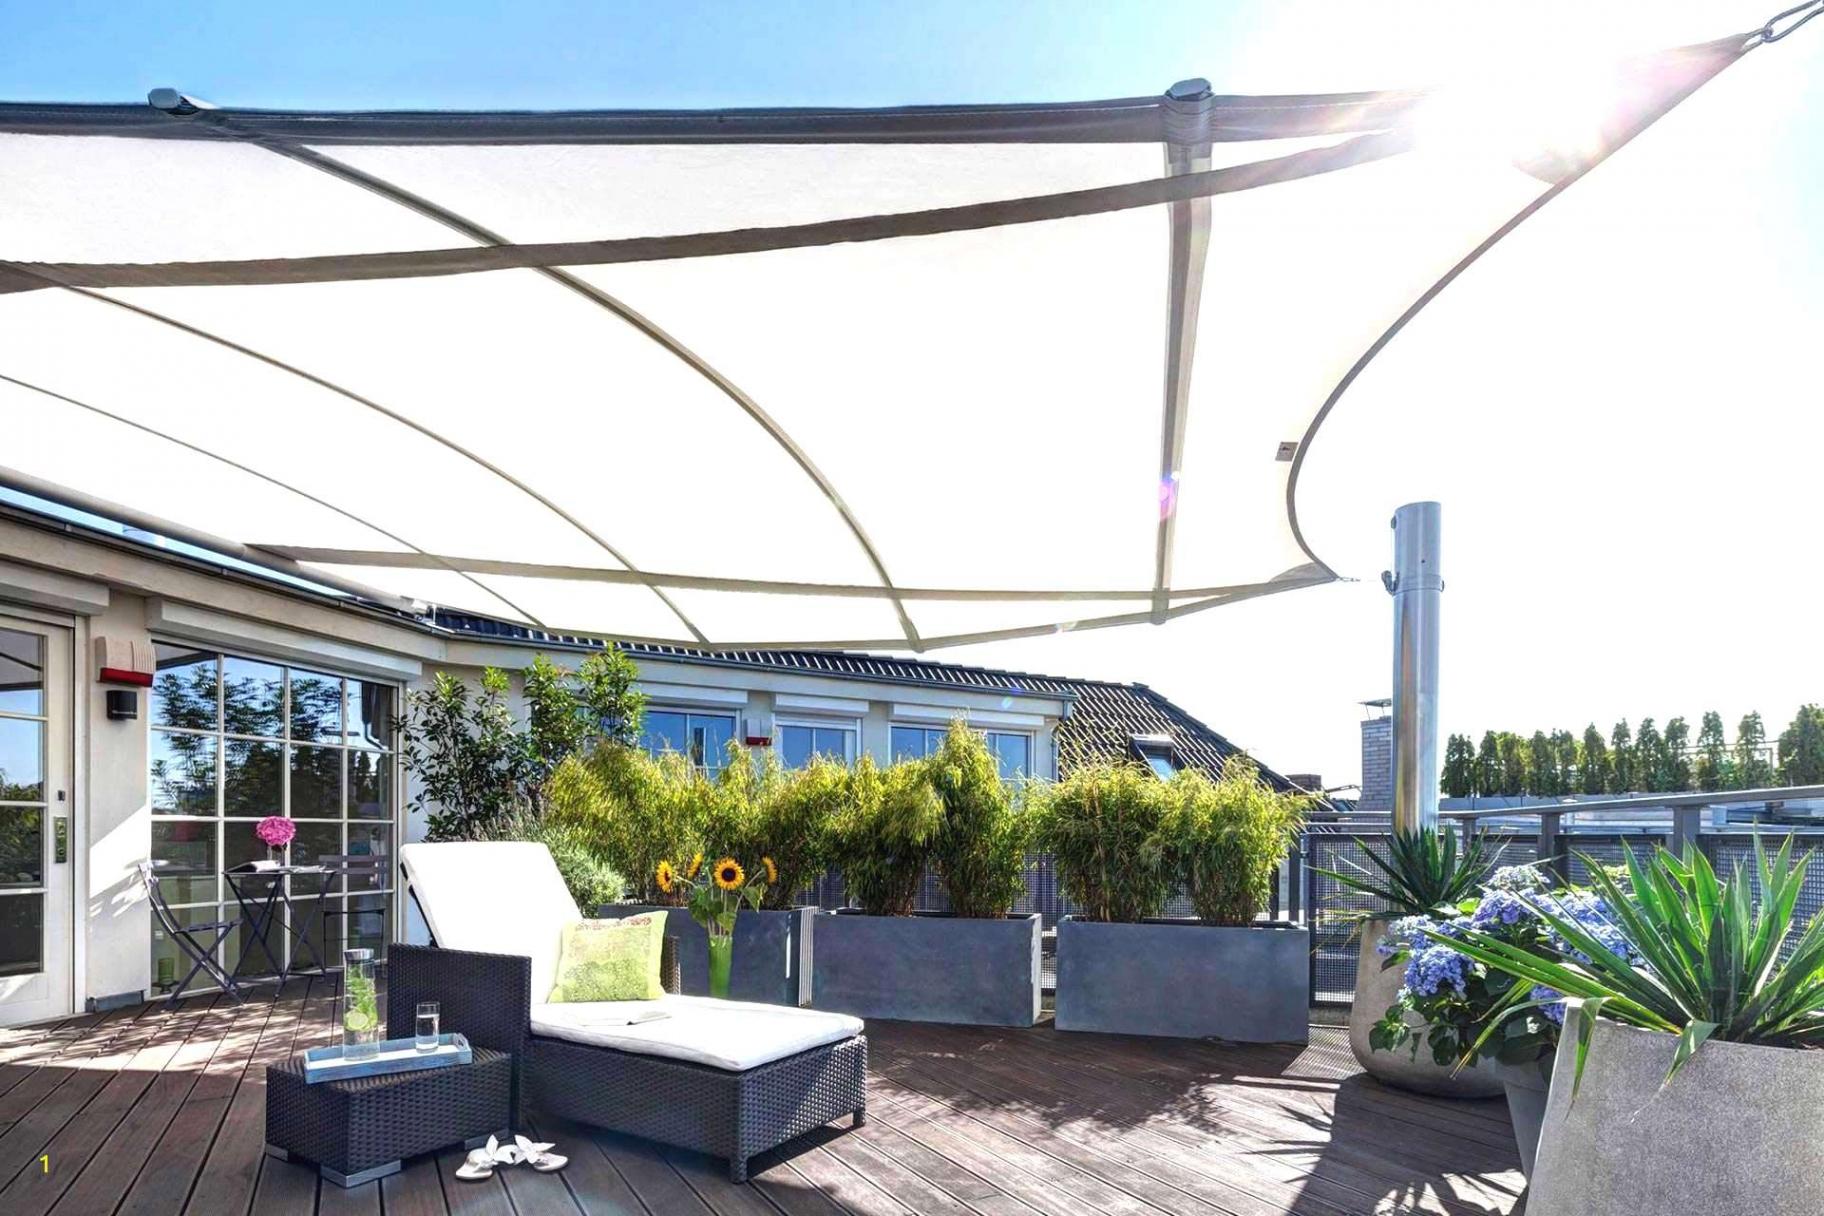 sonnenschutz terrasse pergola einzigartig sonnensegel terrasse sonnenschutz garten terrasse sonnenschutz garten terrasse